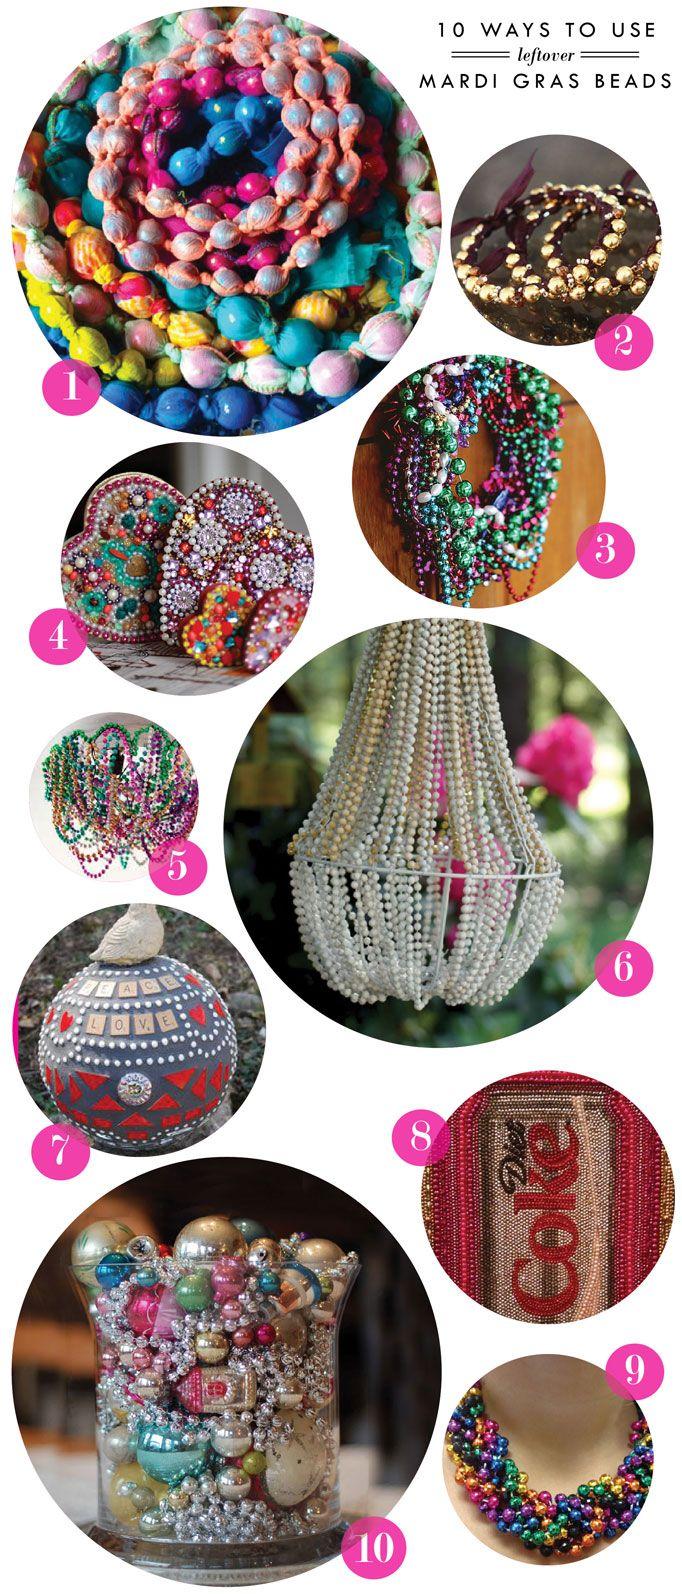 Craft time: 10 Ways to use leftover mardi gras beads